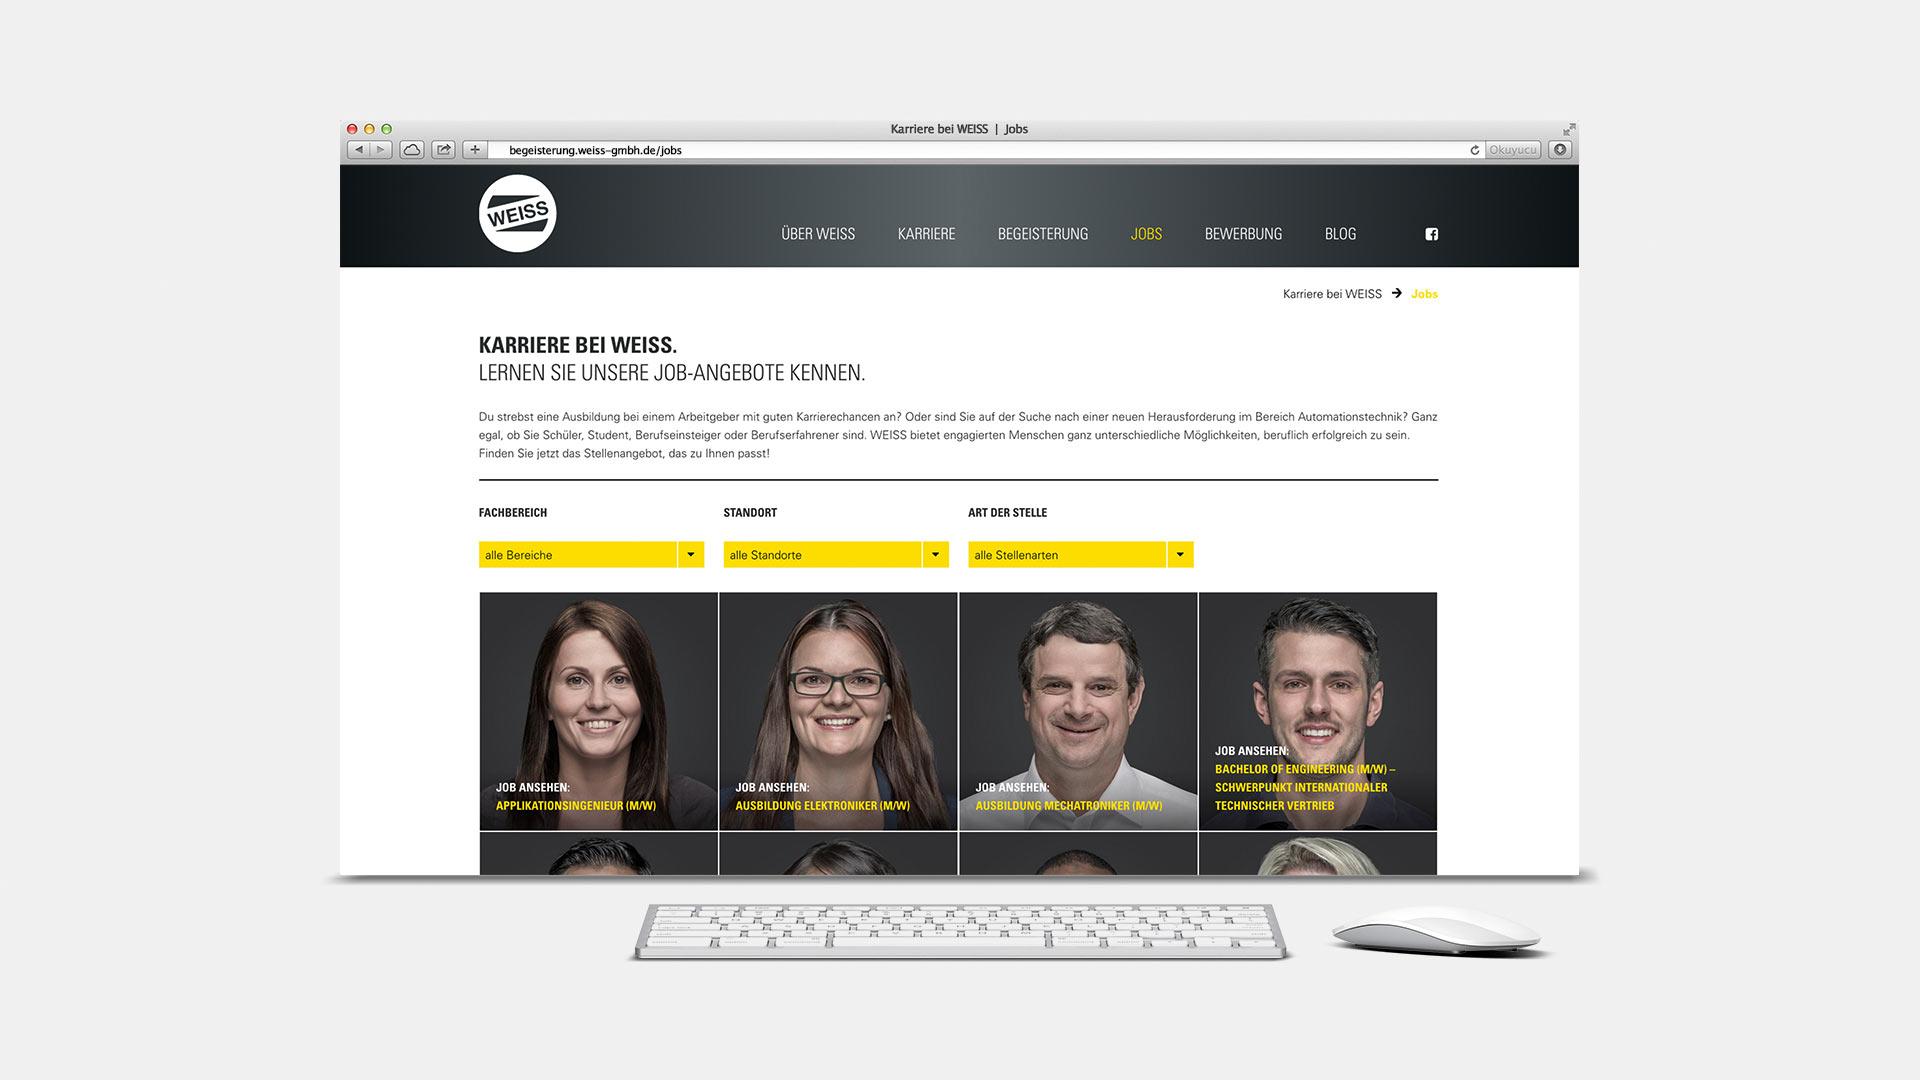 OPUS Marketing / Projekt / Karriere bei WEISS / Website Jobs